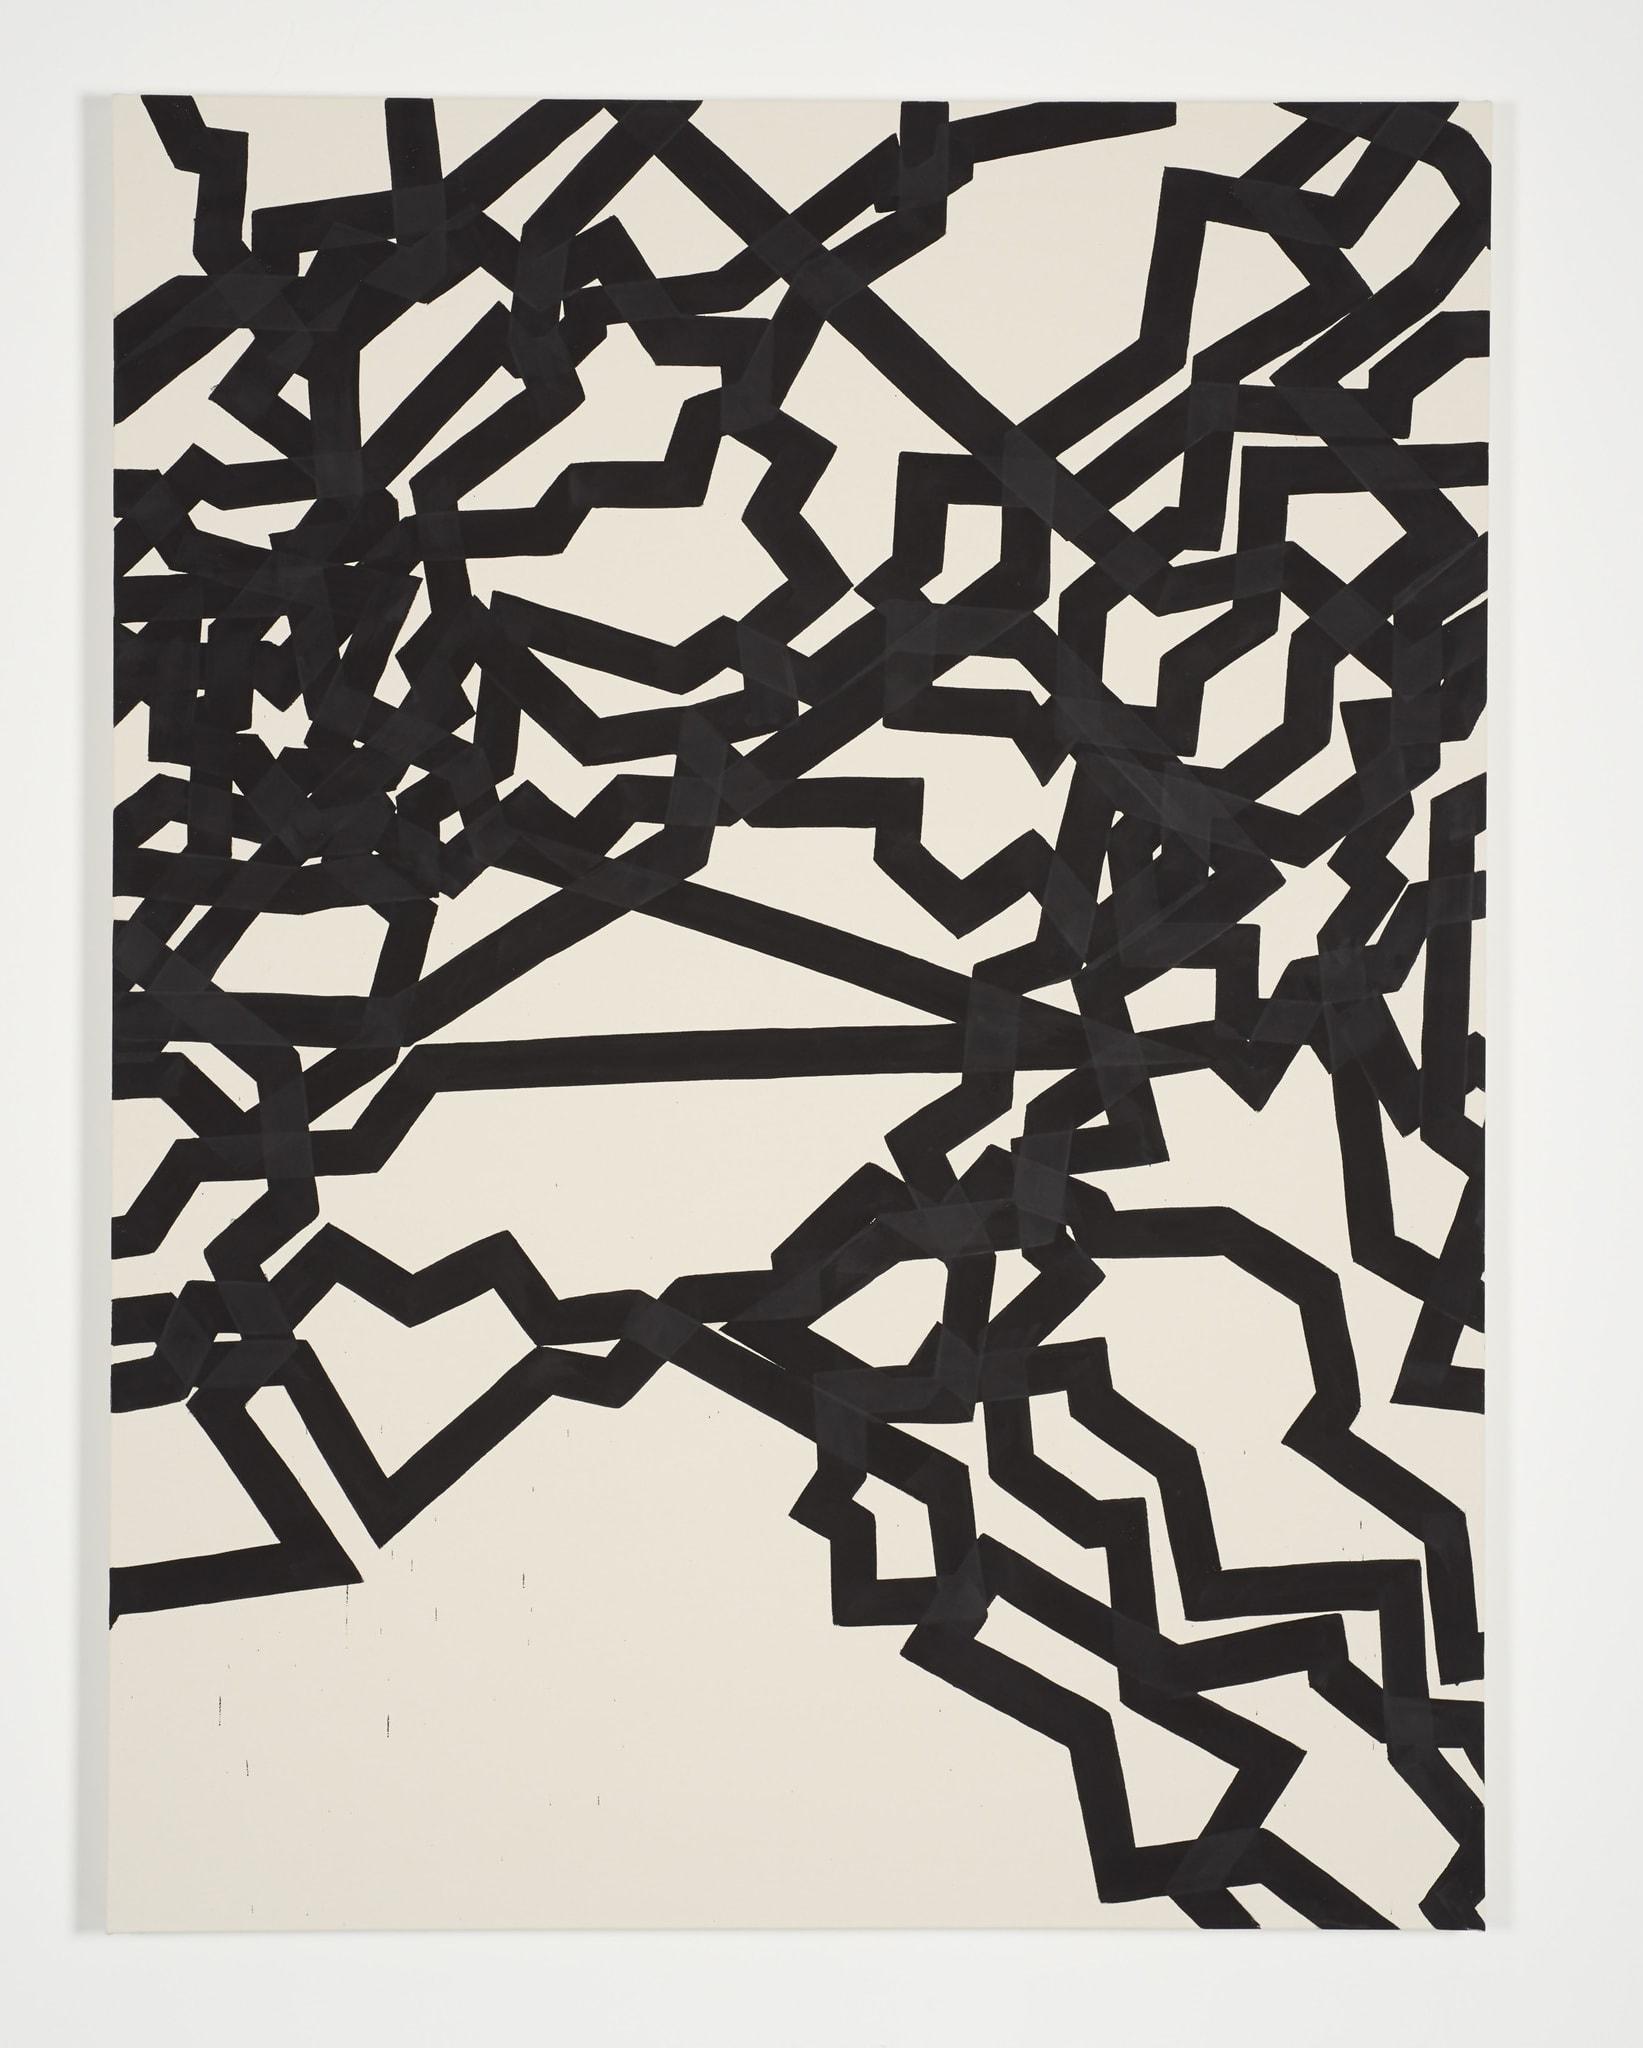 Derive 48 by Latifa Echakhch